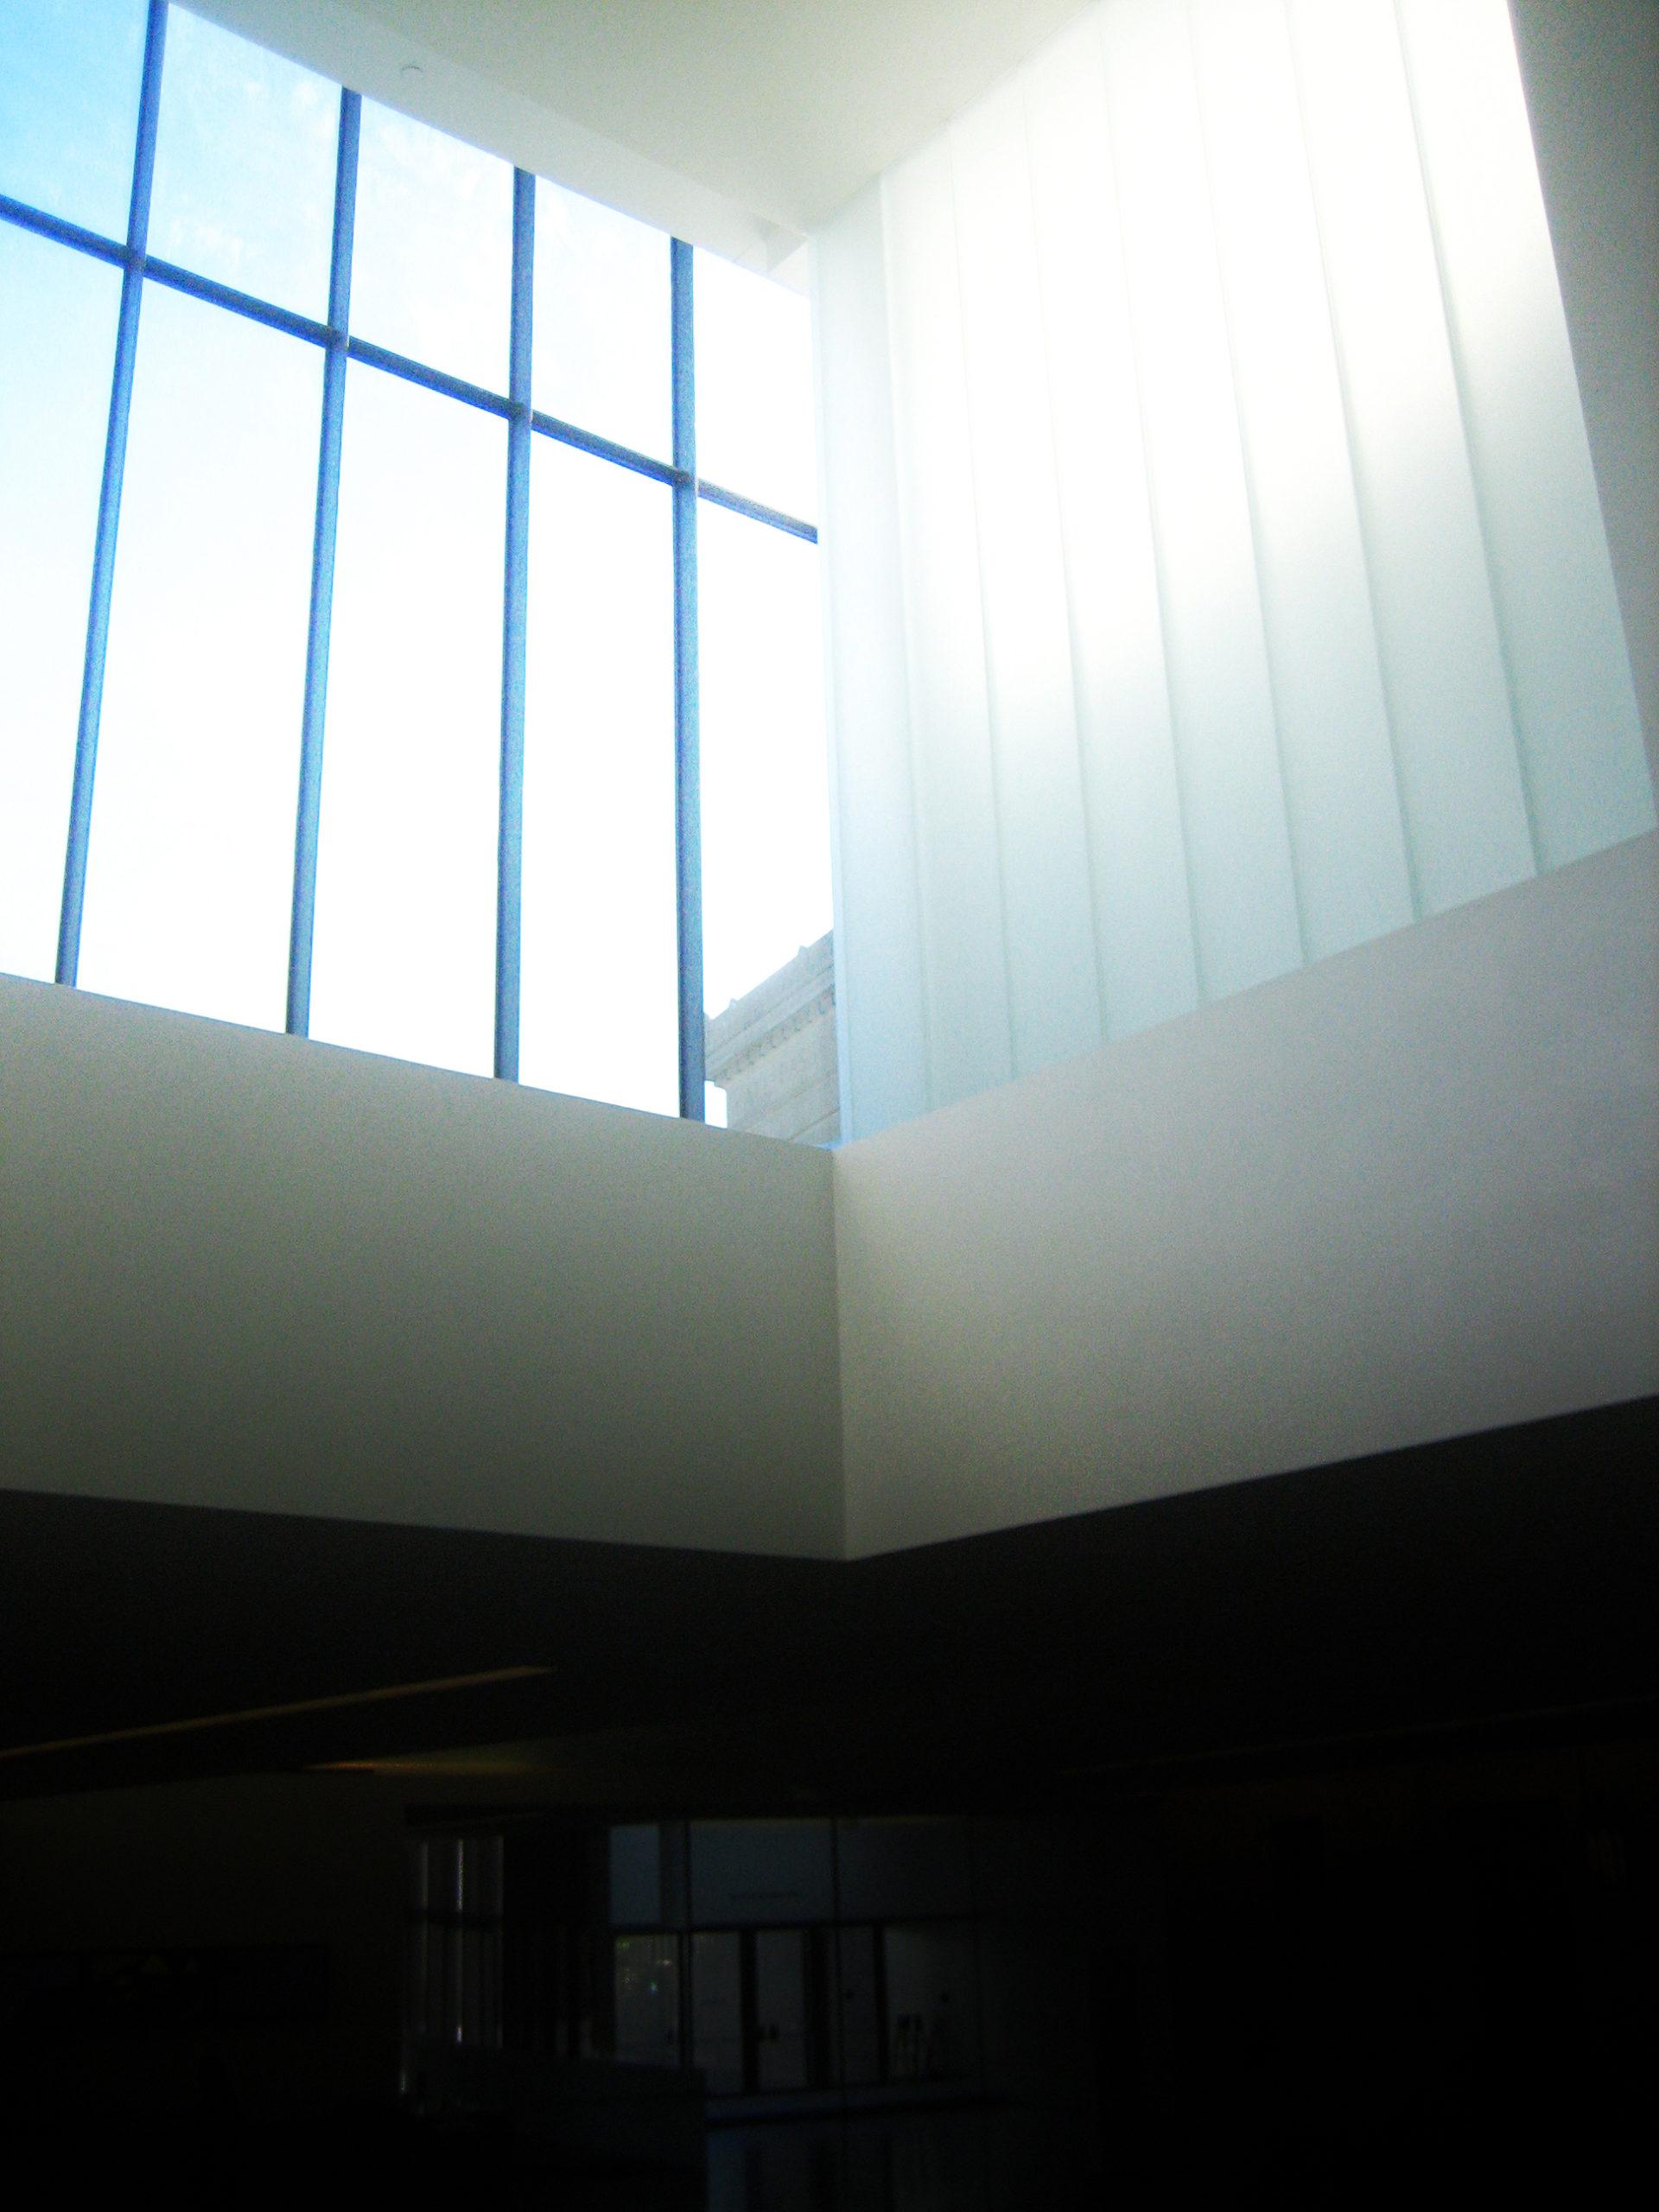 Block Building, Nelson Atkins Museum of Art, Kansas City Missouri, September 2007